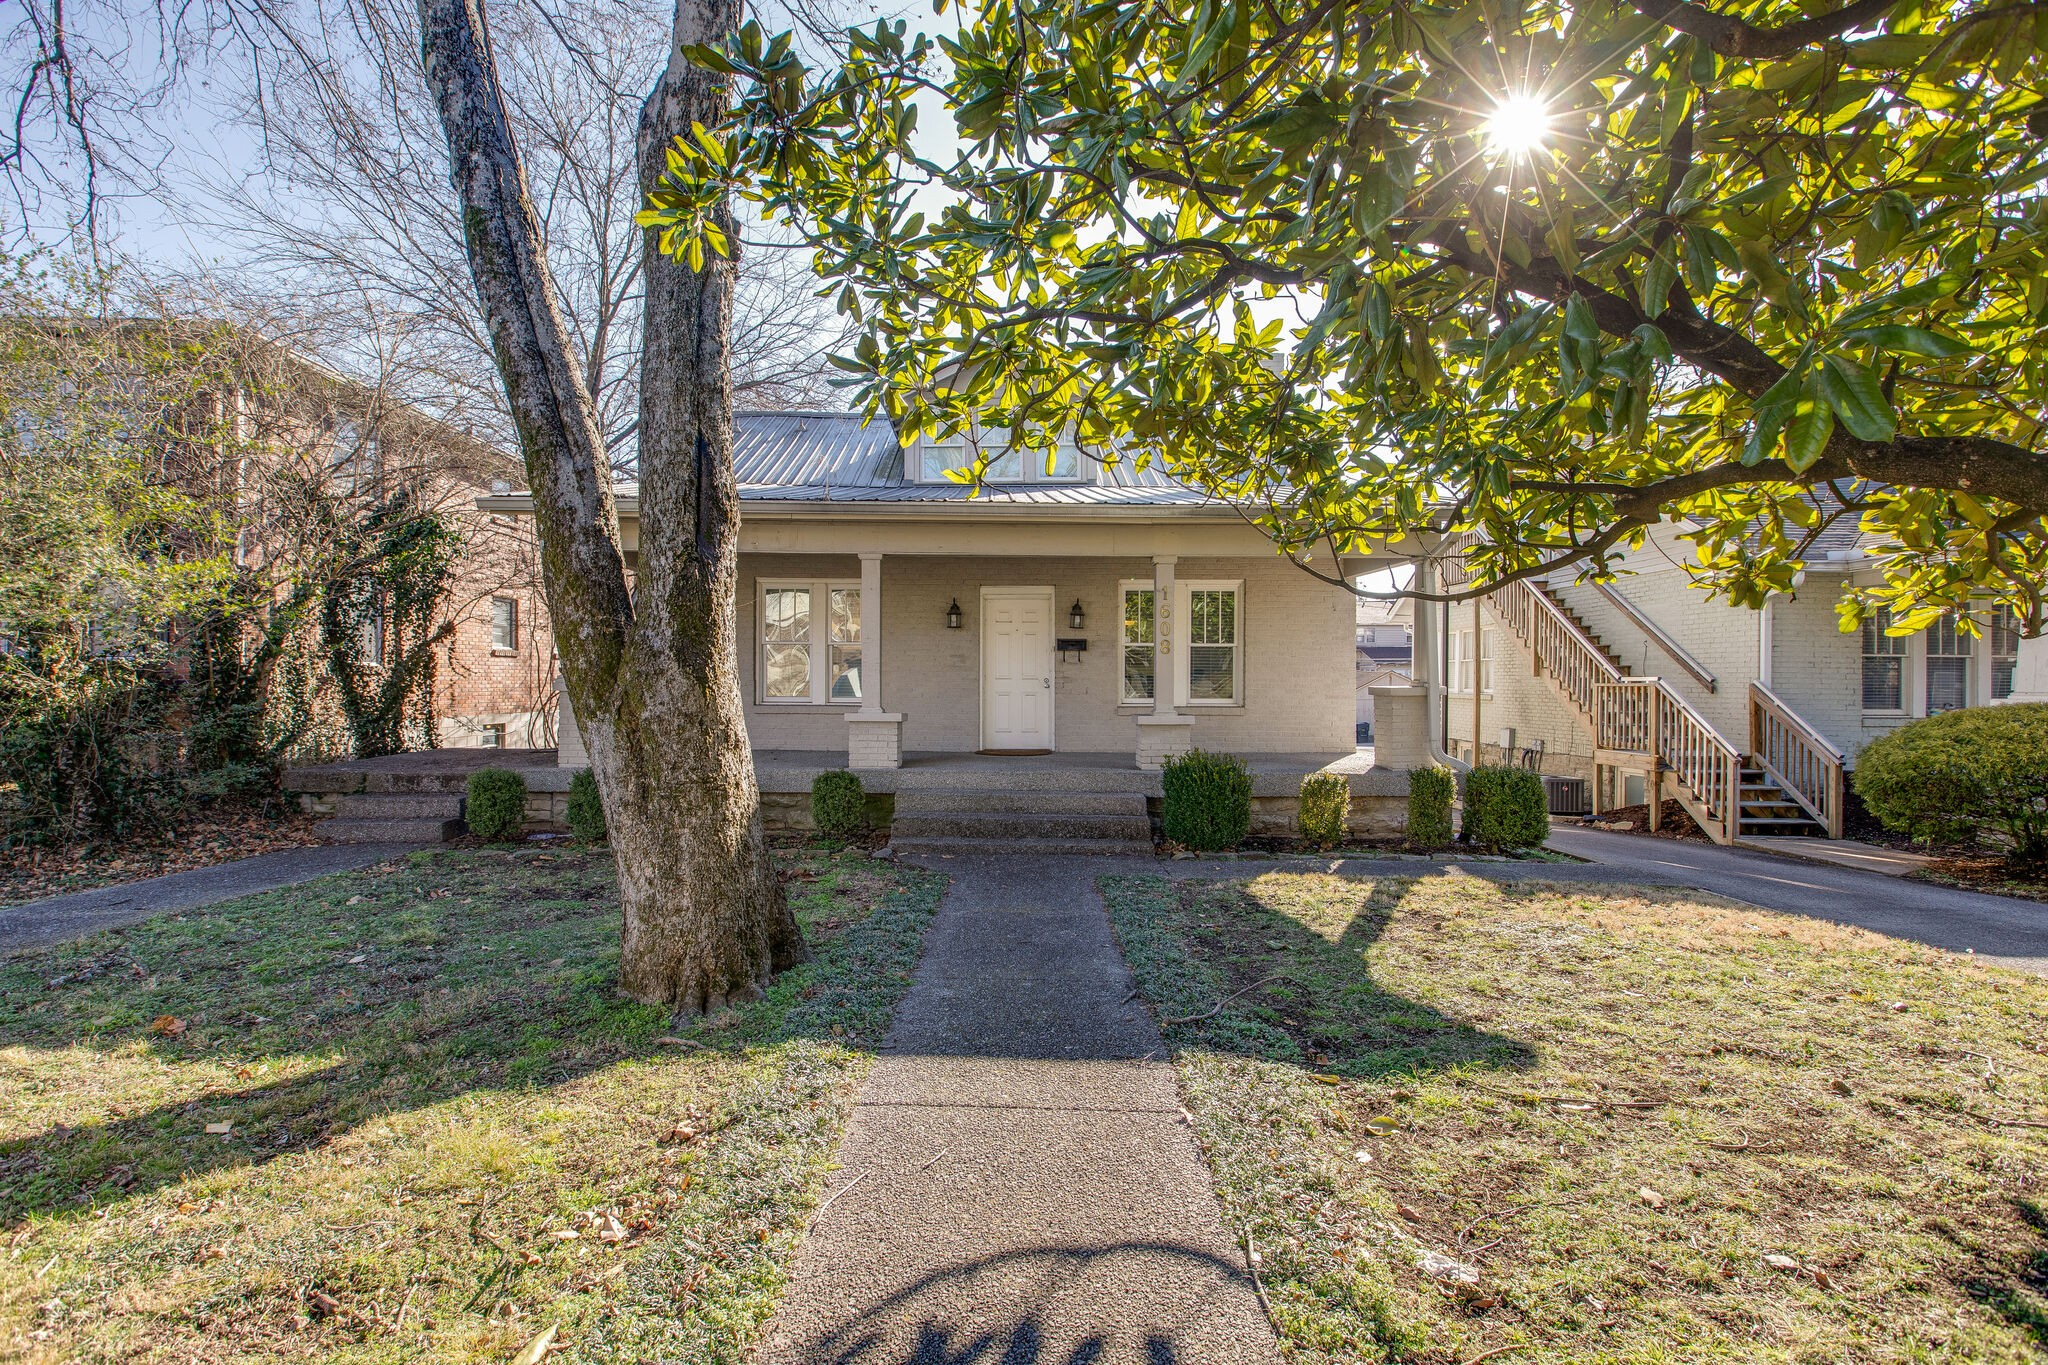 1608 17th Ave S Property Photo - Nashville, TN real estate listing